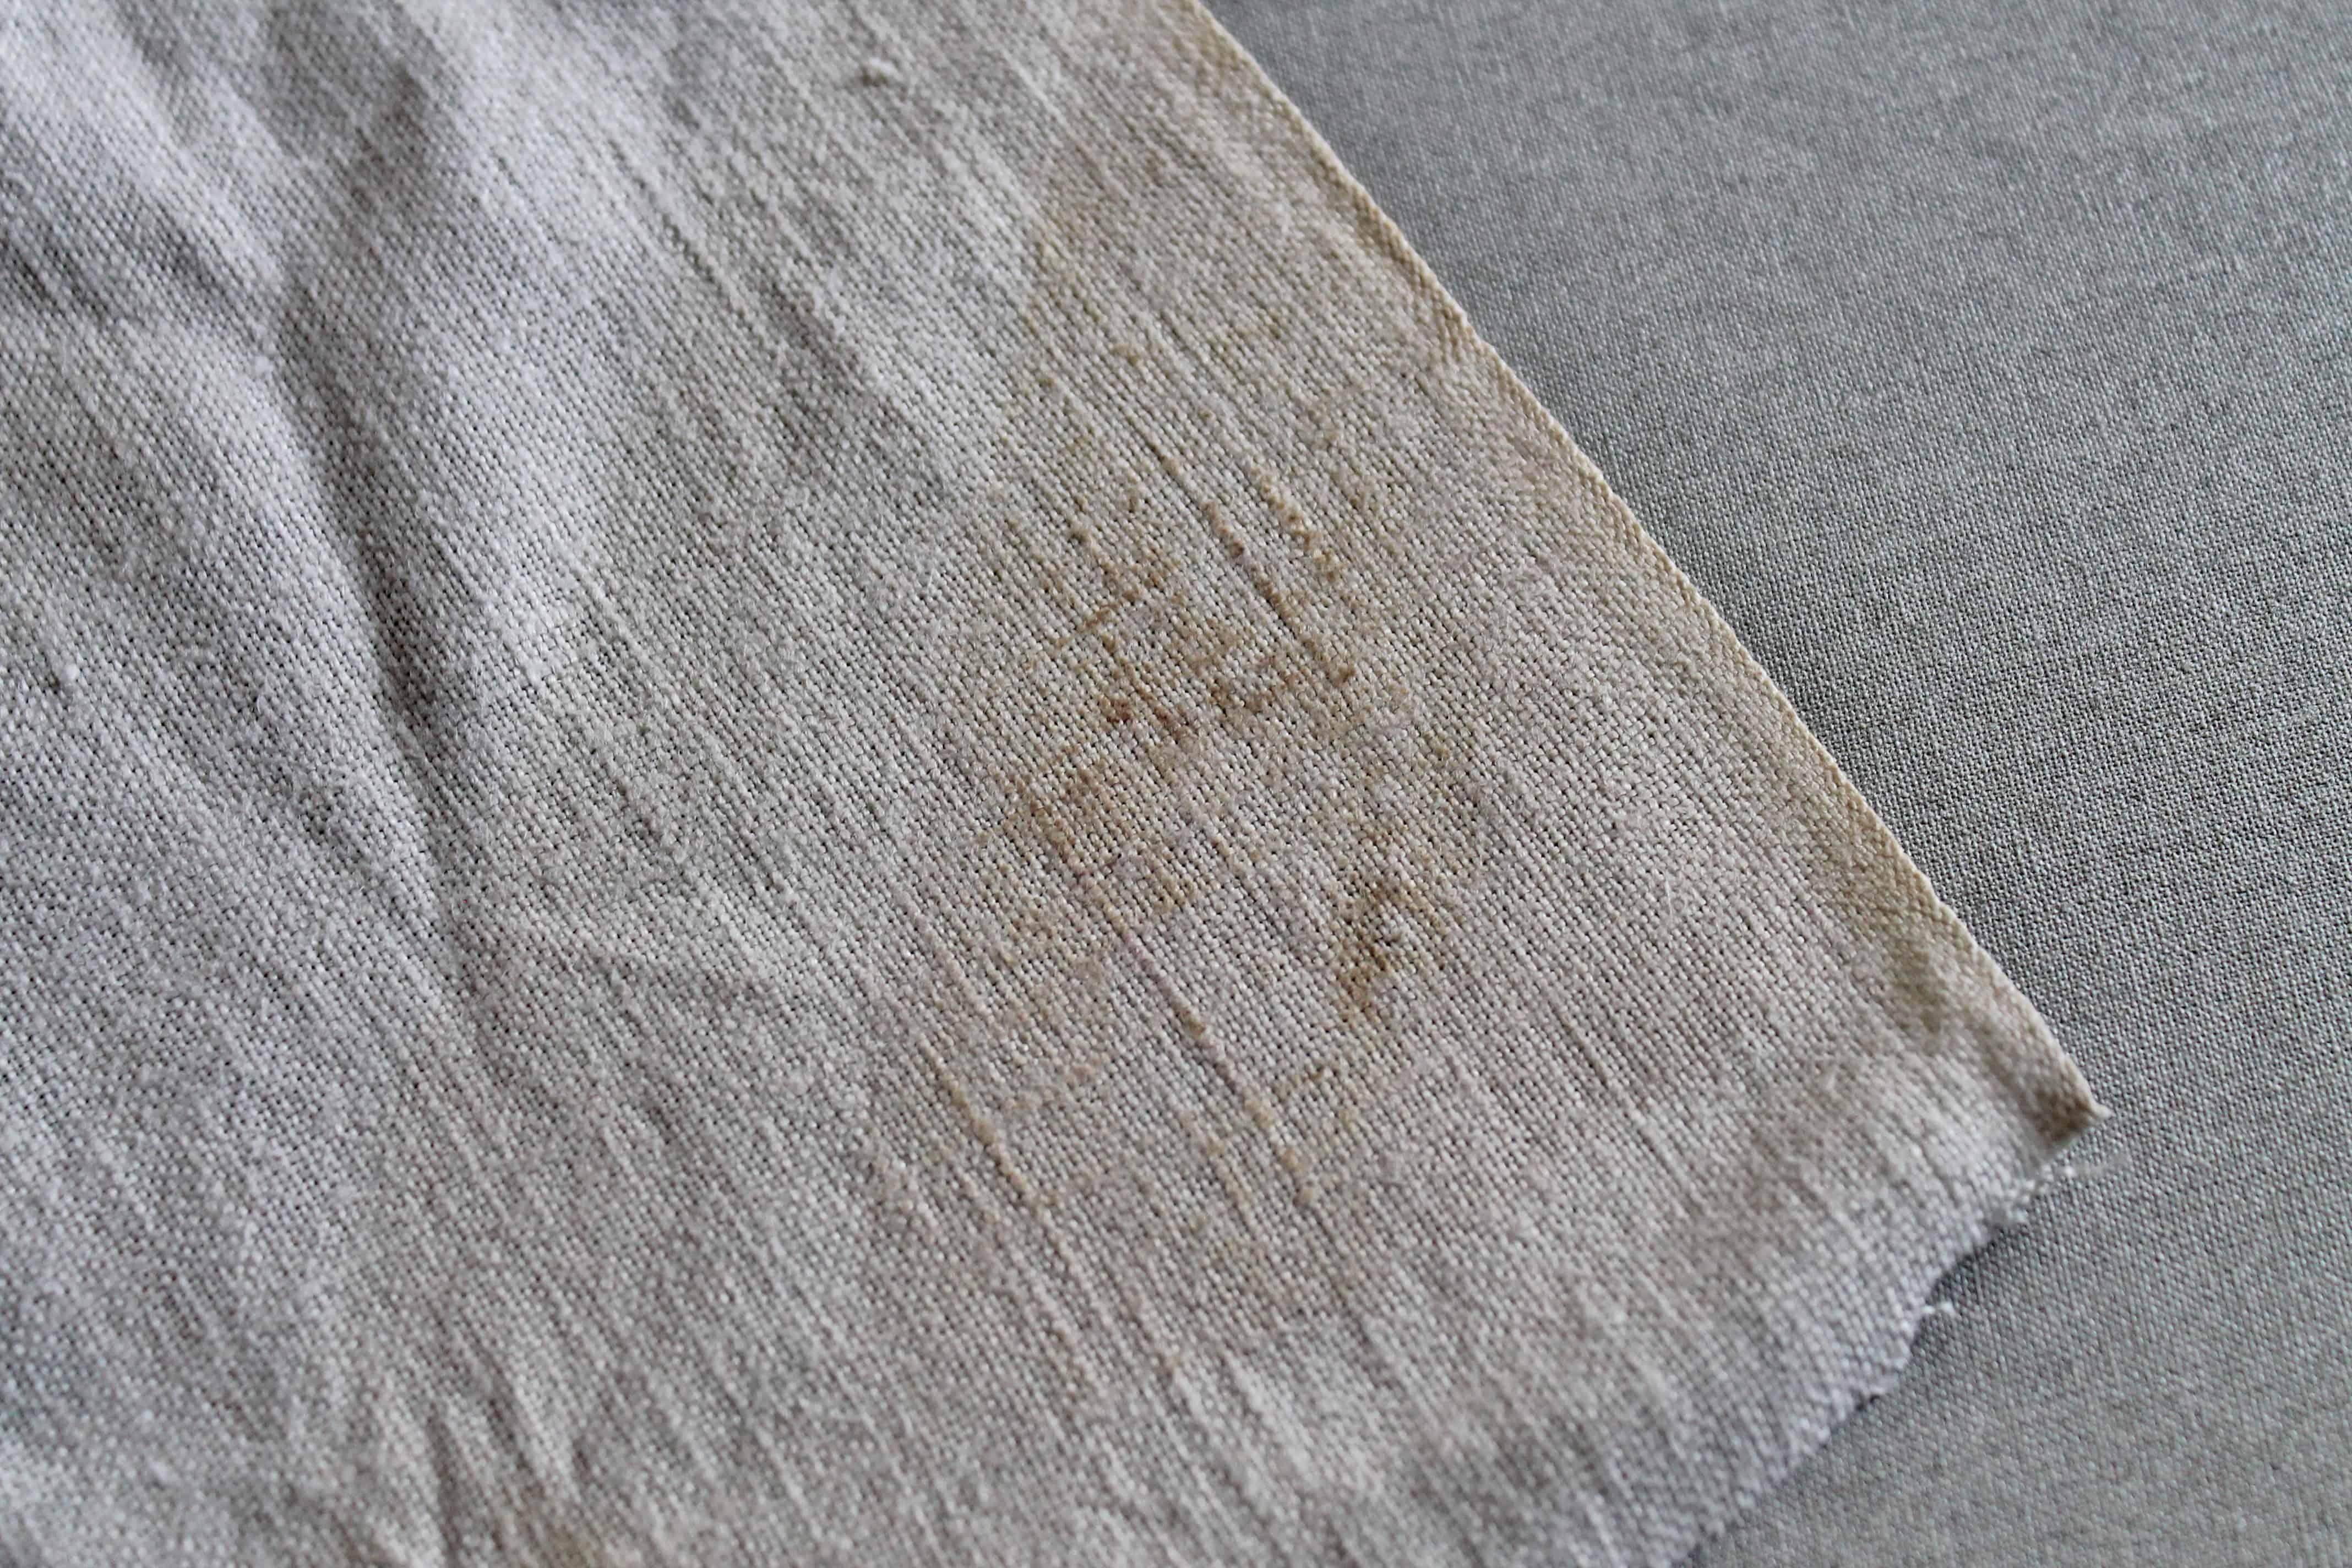 Scorch mark on linen (2)